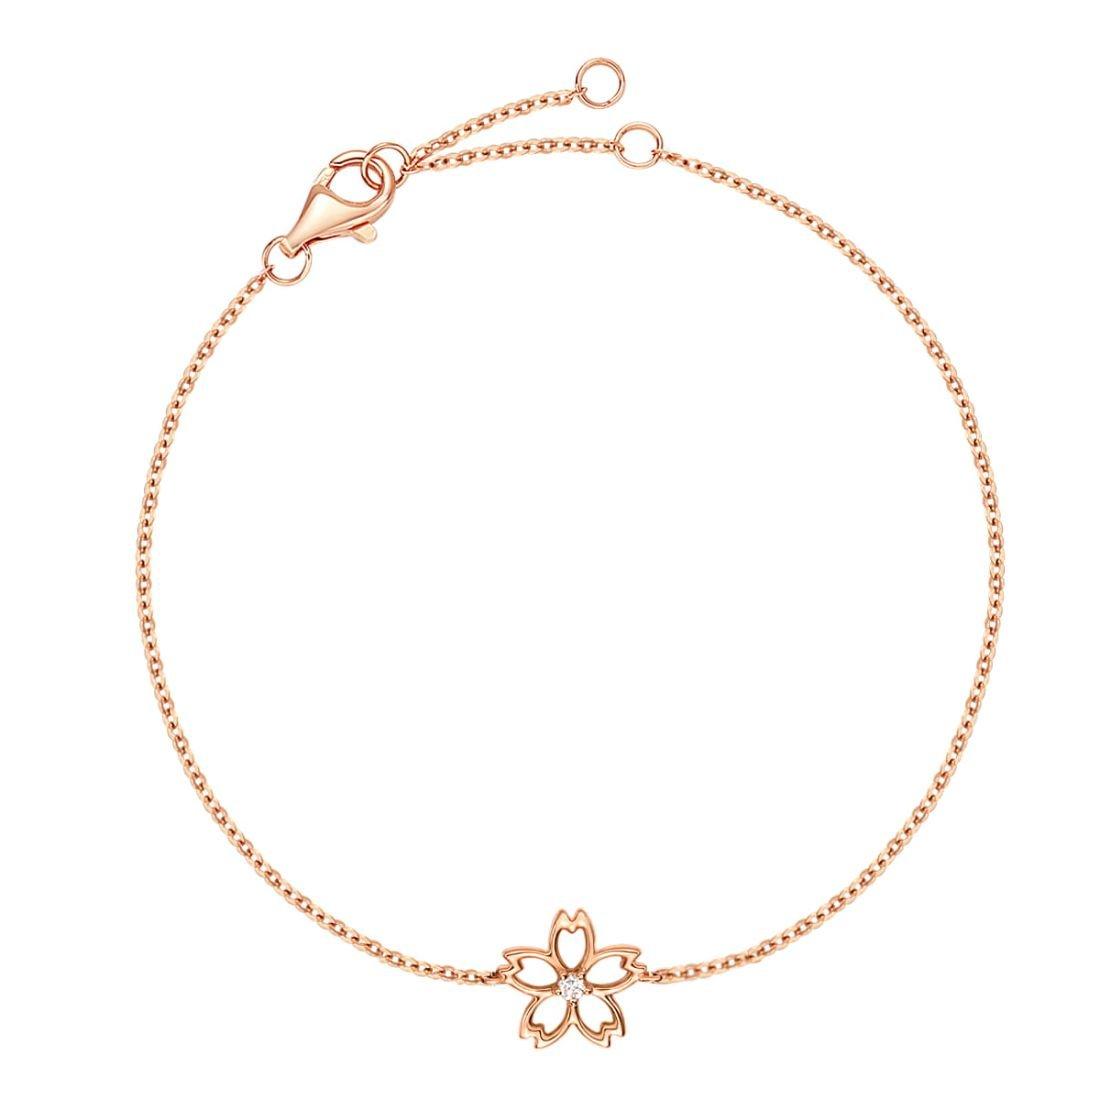 Carleen 14K Solid Rose Gold Diamond Cute Cherry Blossom Flower Delicate Bracelet Dainty Fine Jewelry for Women Girls, 7 inch by Carleen